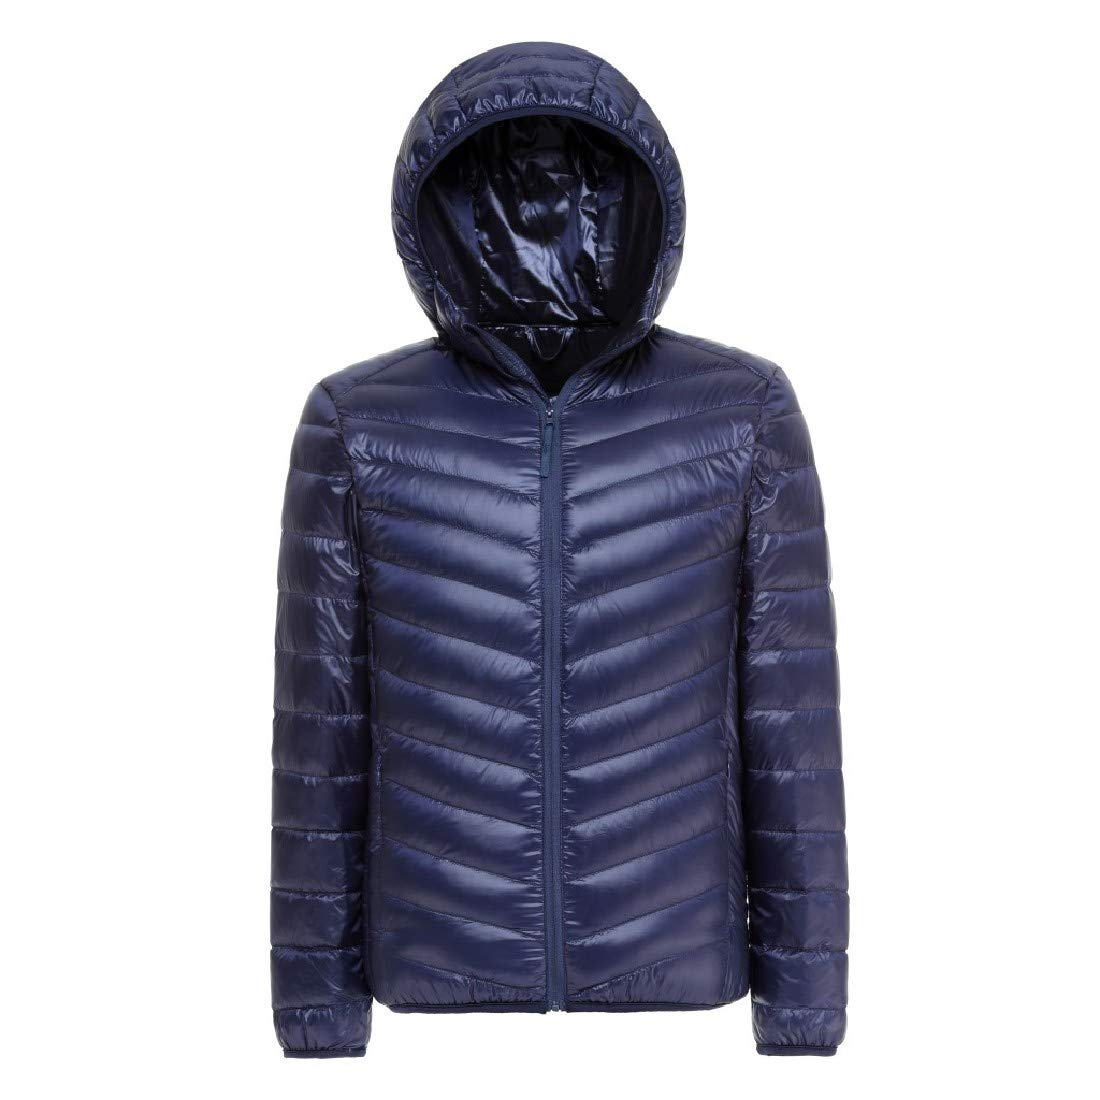 YUNY Men Light Weight Hood Mini Warm Winter Down Coat Navy Blue S